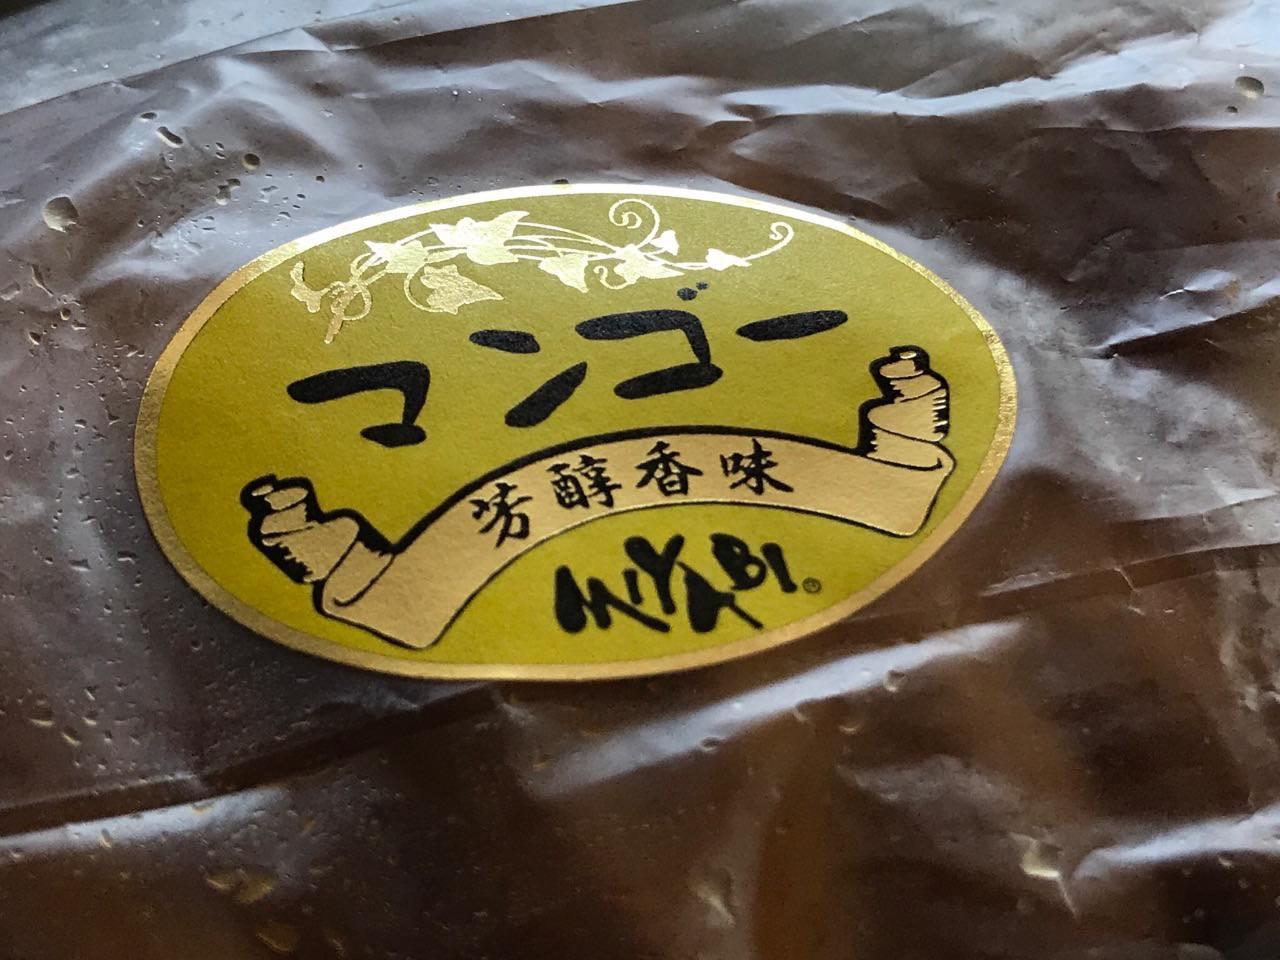 MIYABI デニッシュ食パン マンゴー